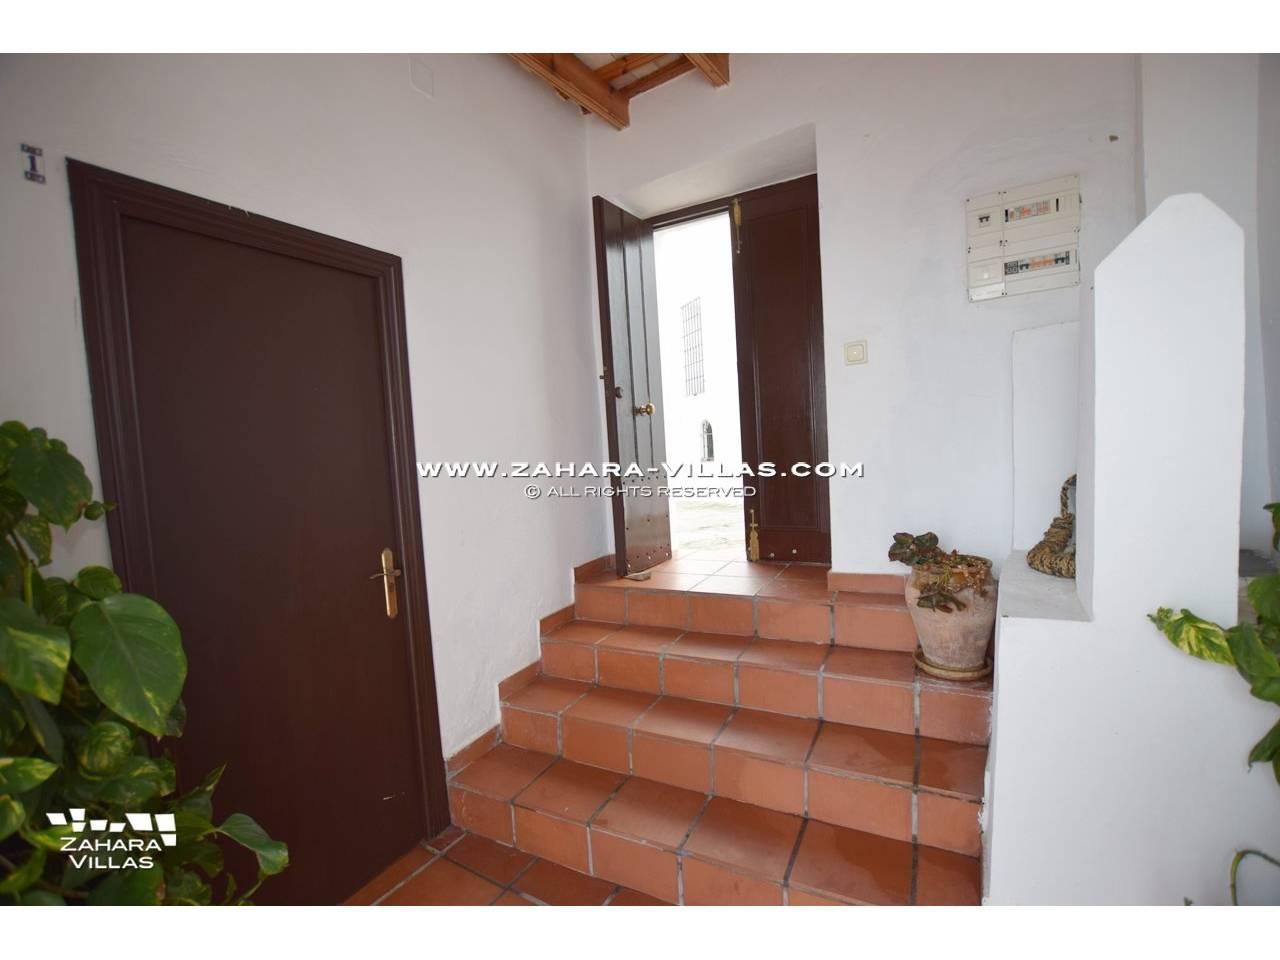 Imagen 18 de House, Apartment and Plot to build in the historic center of Vejer de la Frontera